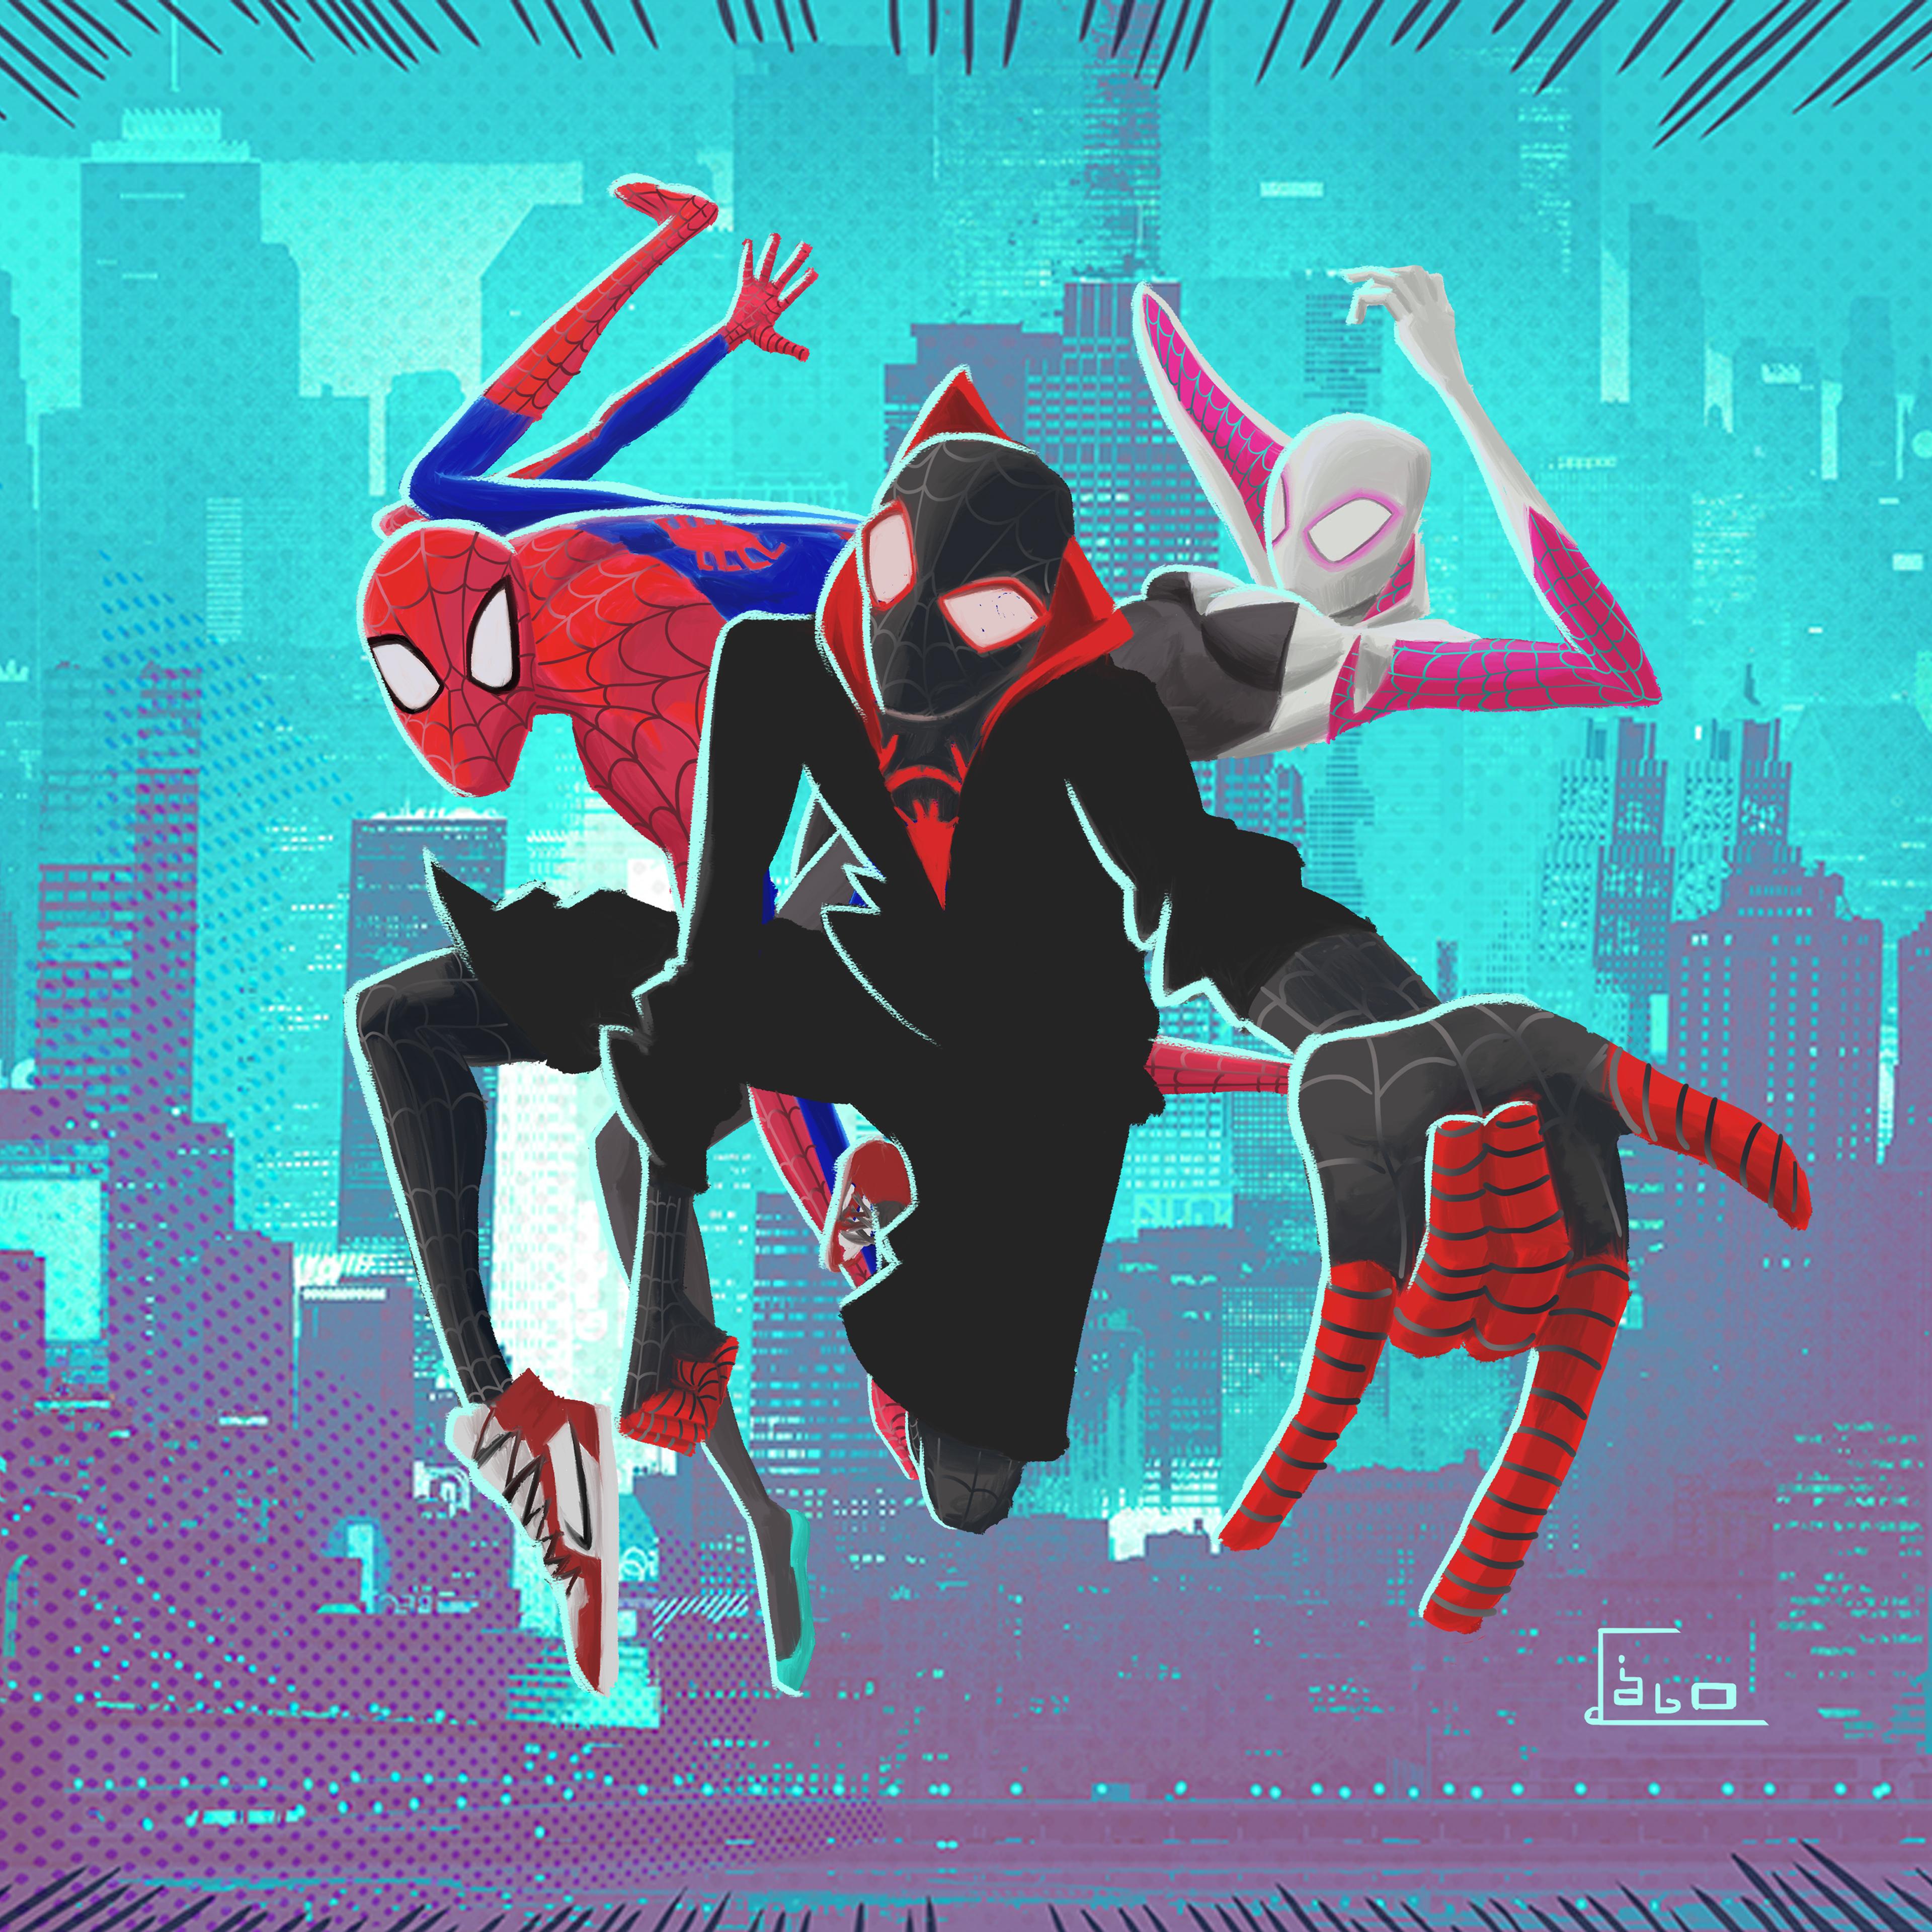 1440x900 Spiderman Into The Spider Verse 4k New Artwork 1440x900